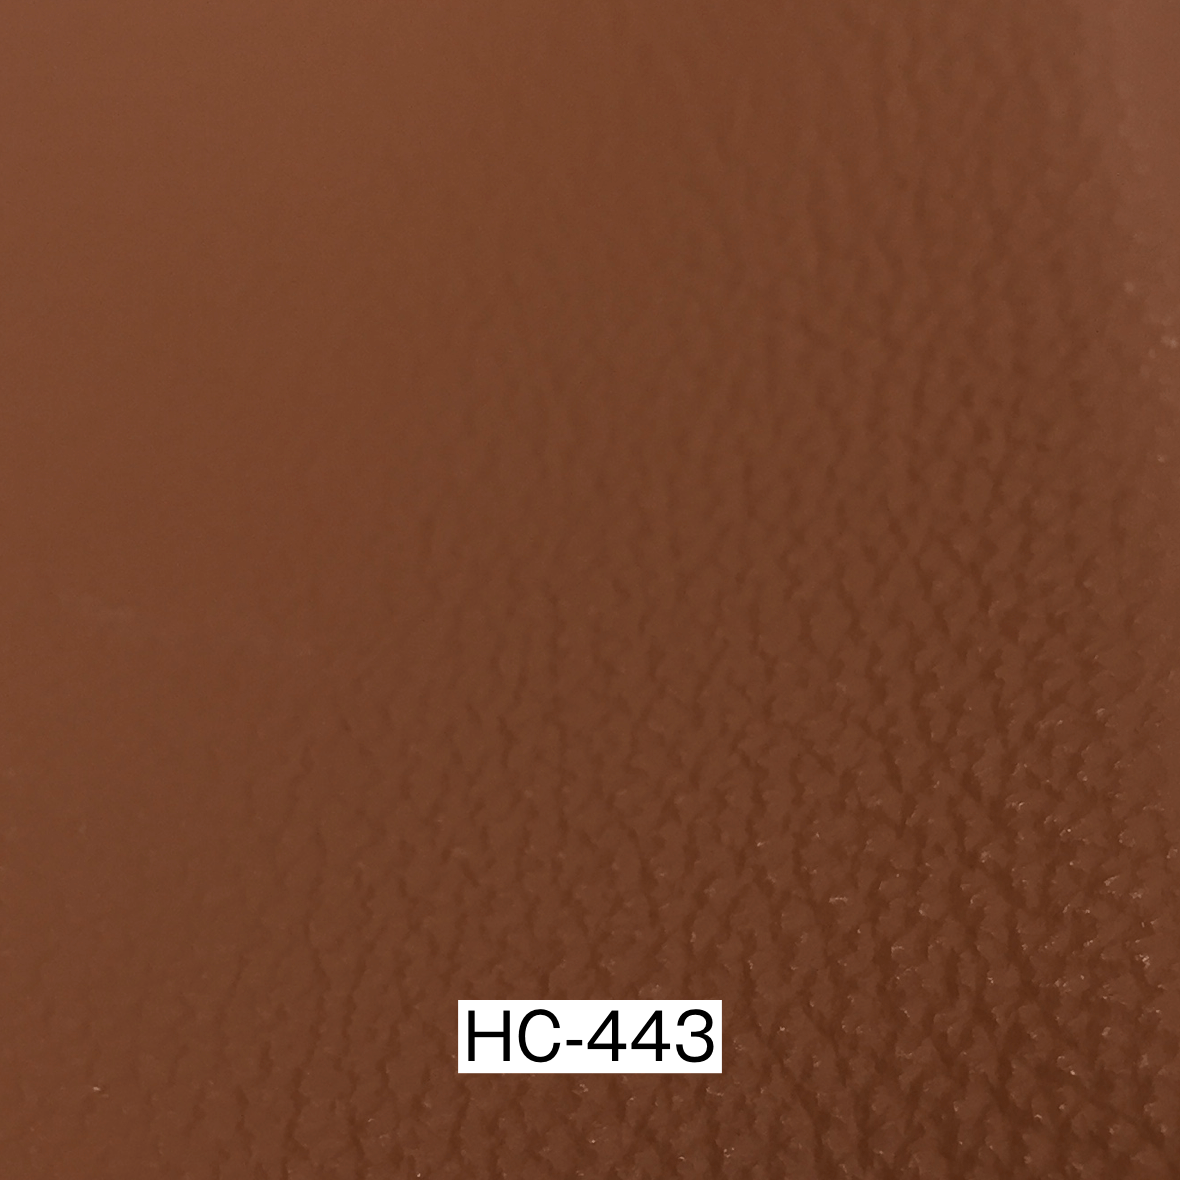 ERベイカー2 HC-443 革サンプル